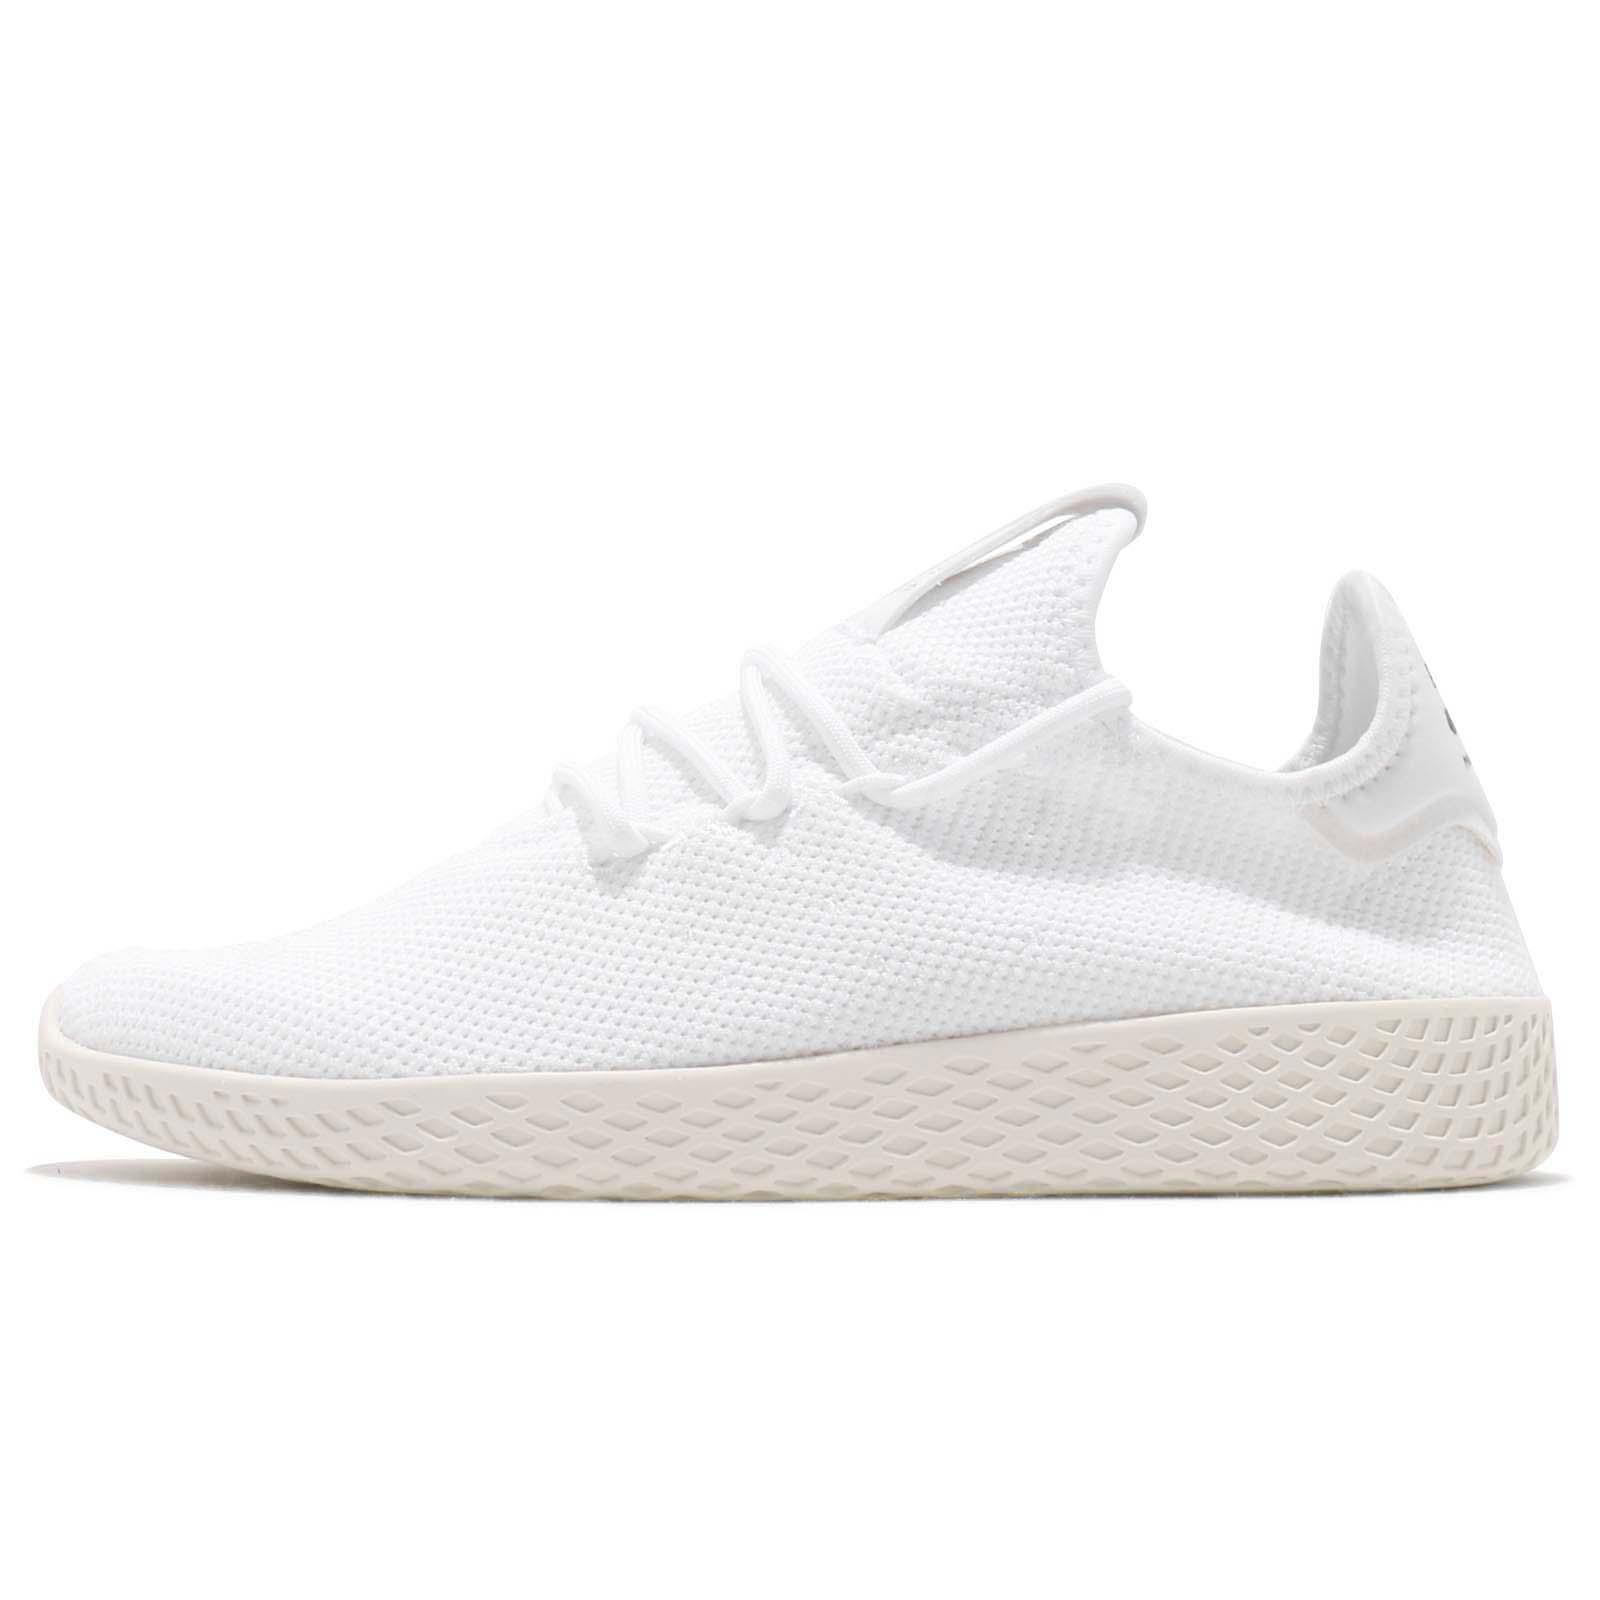 brand new 9fdc6 57e83 adidas Originals PW Tennis Hu Pharrell Williams White Black Men Women B41792